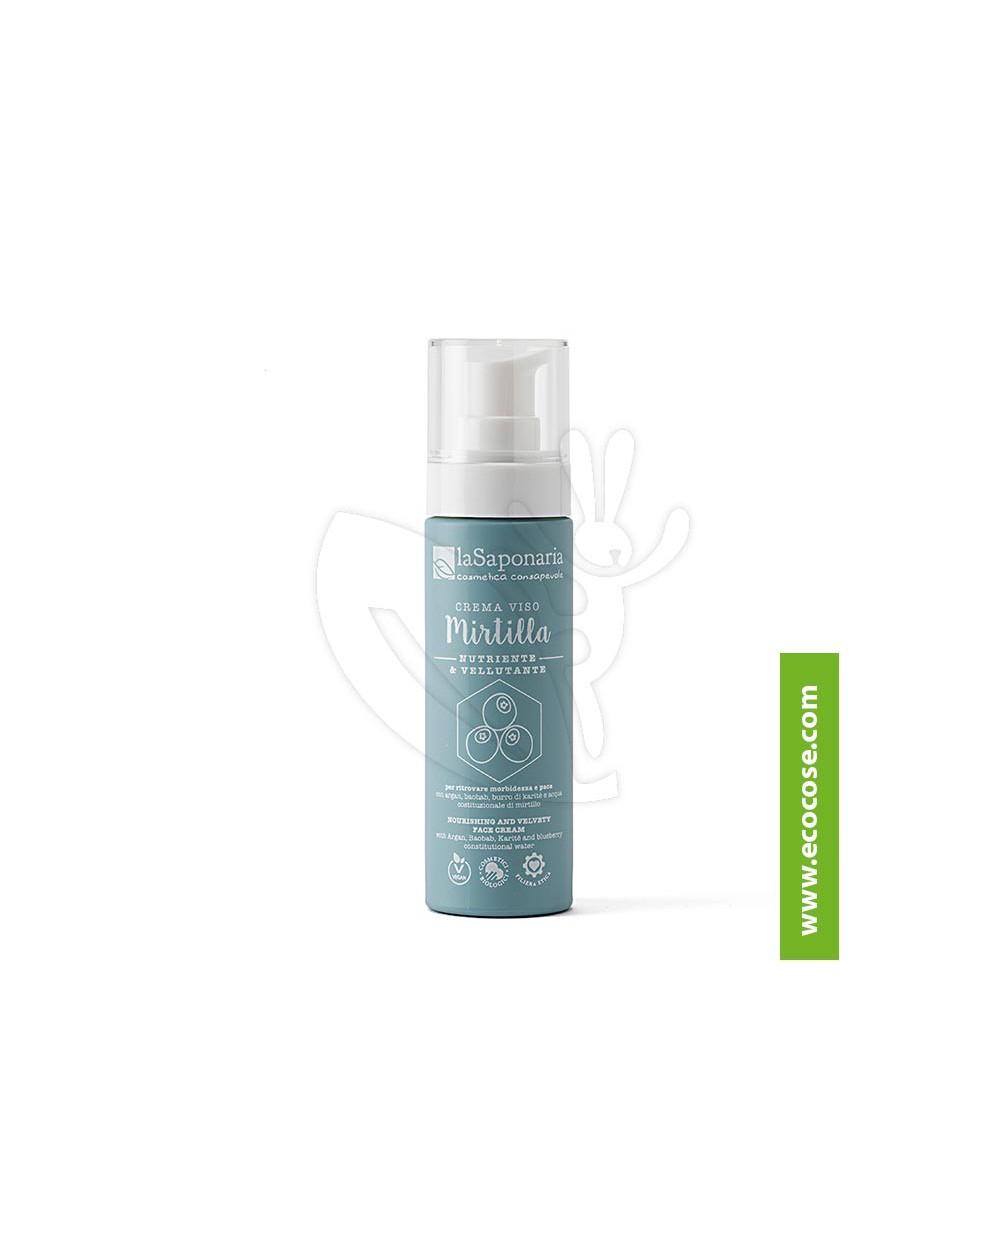 La Saponaria - Costituzionale - Crema viso nutriente vellutante Mirtilla